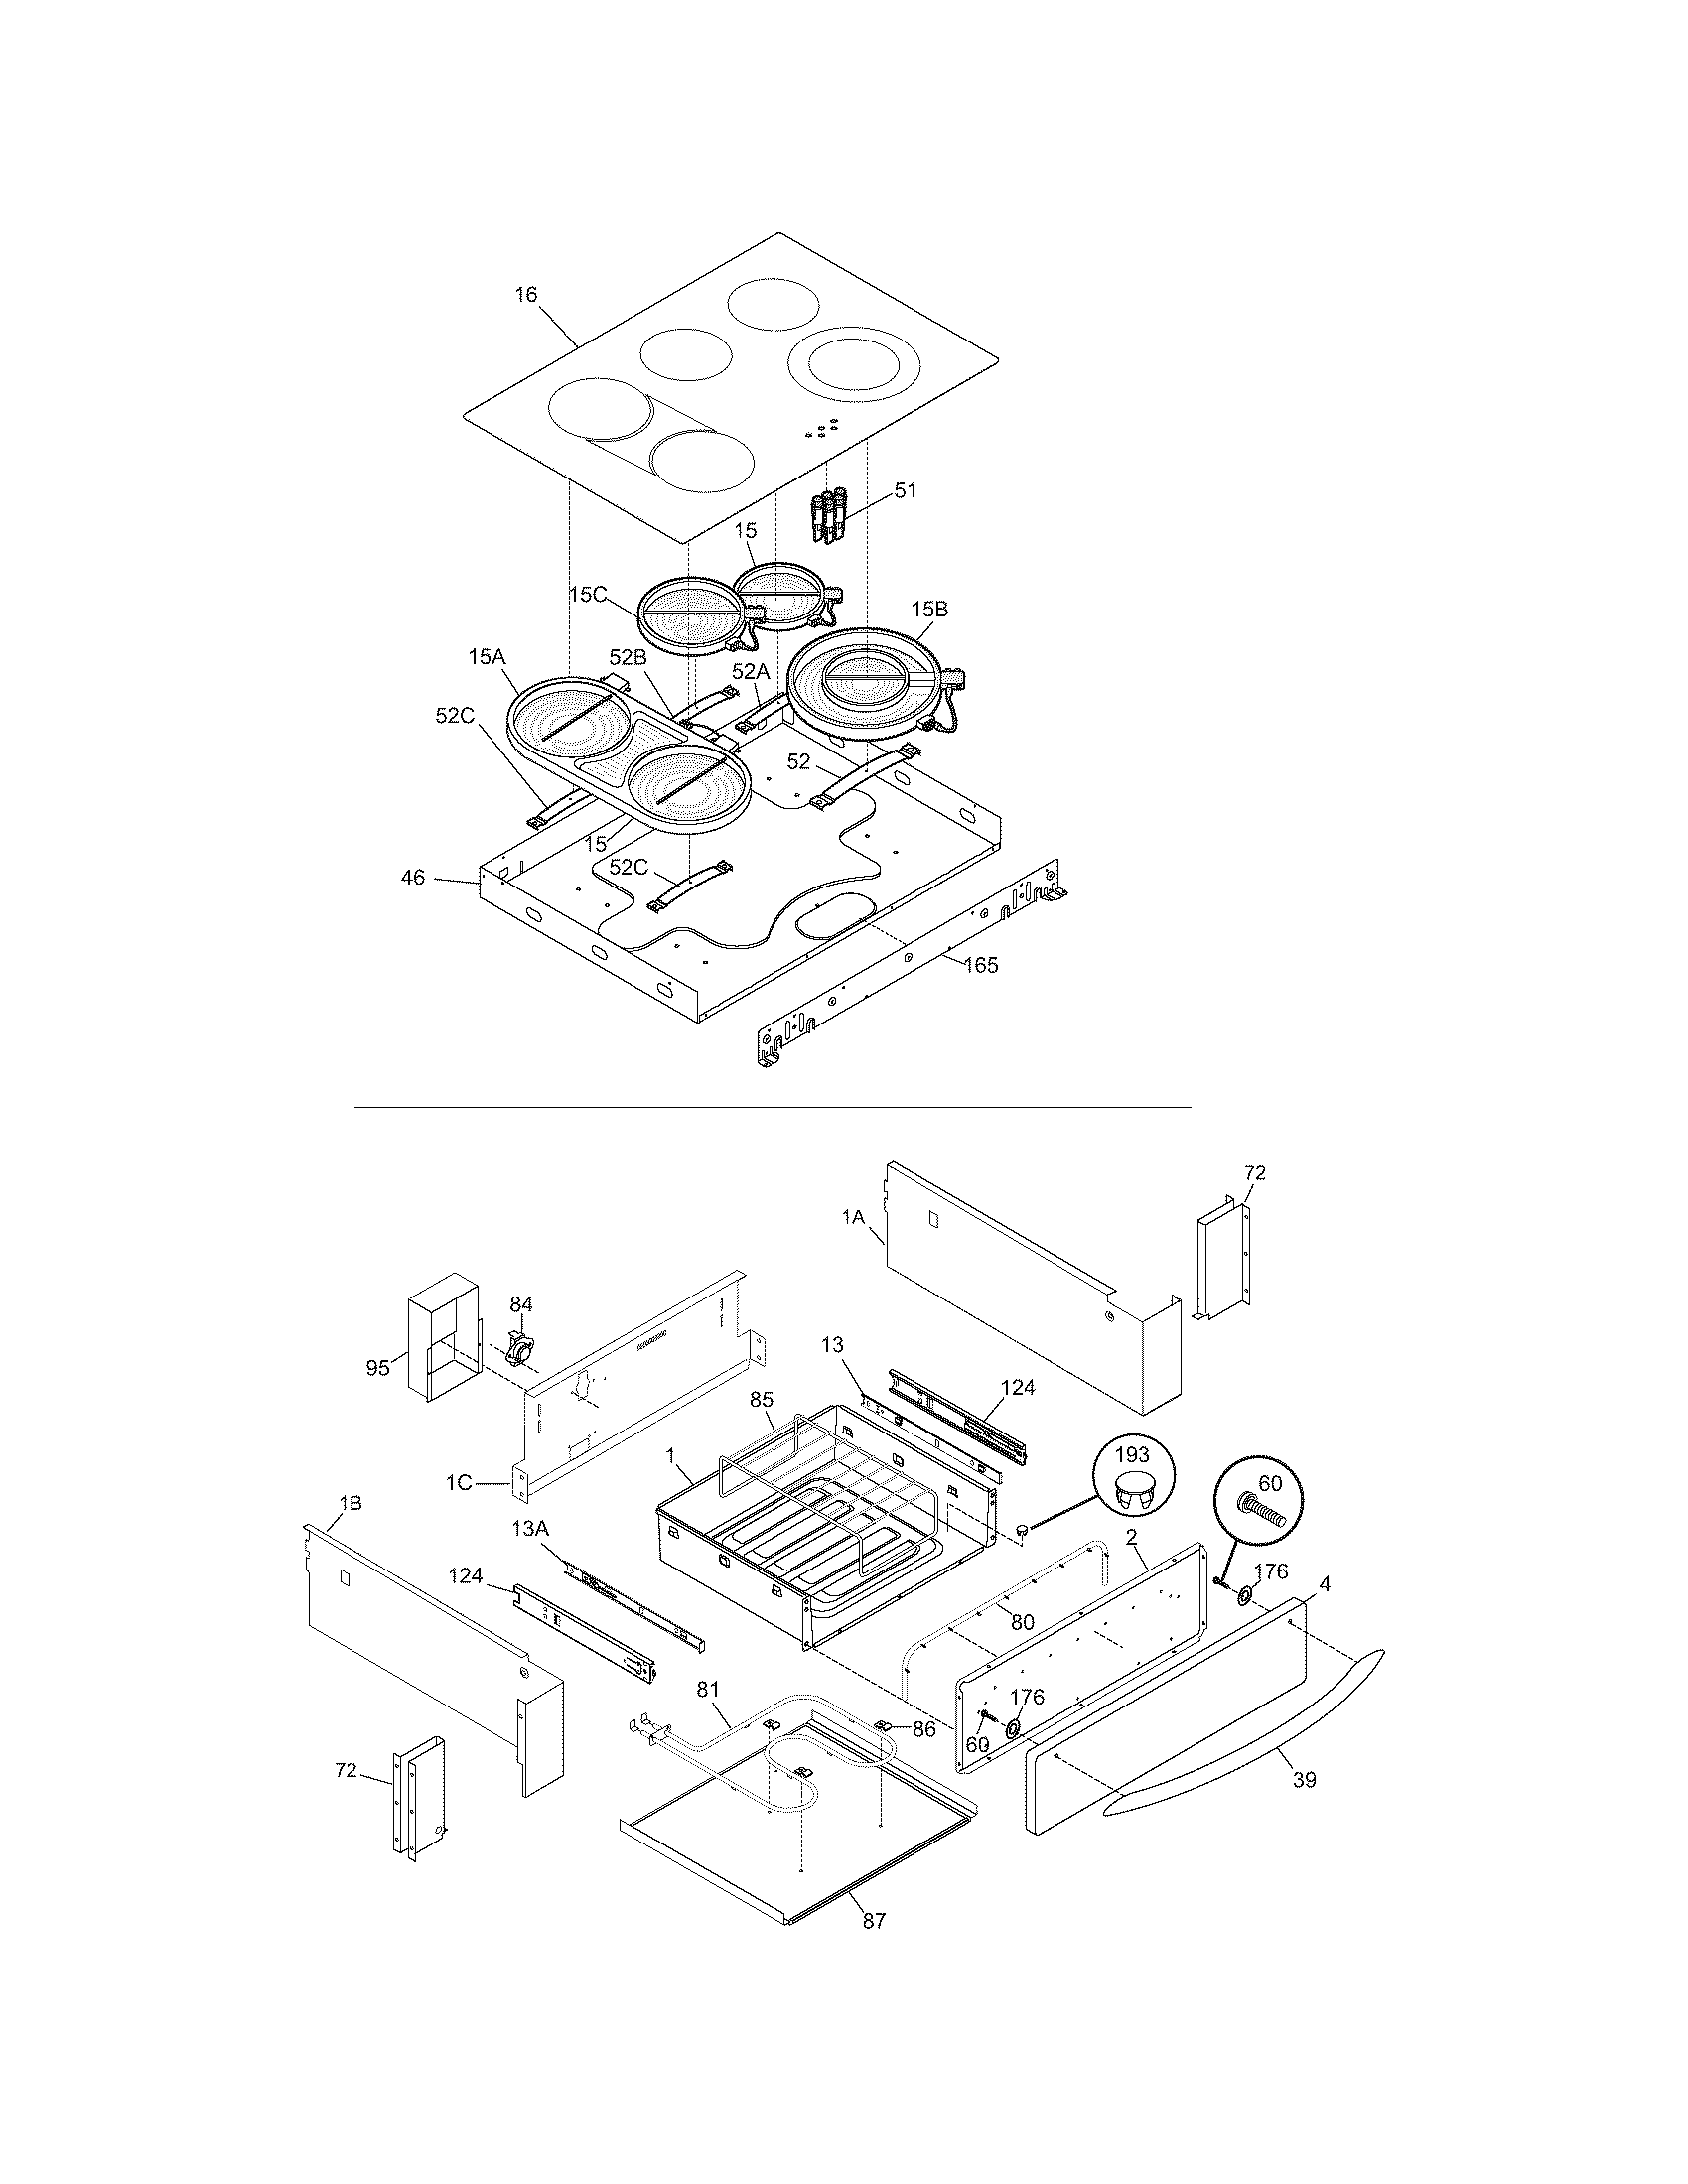 Diagram Stove Wiring Element Errs975d25